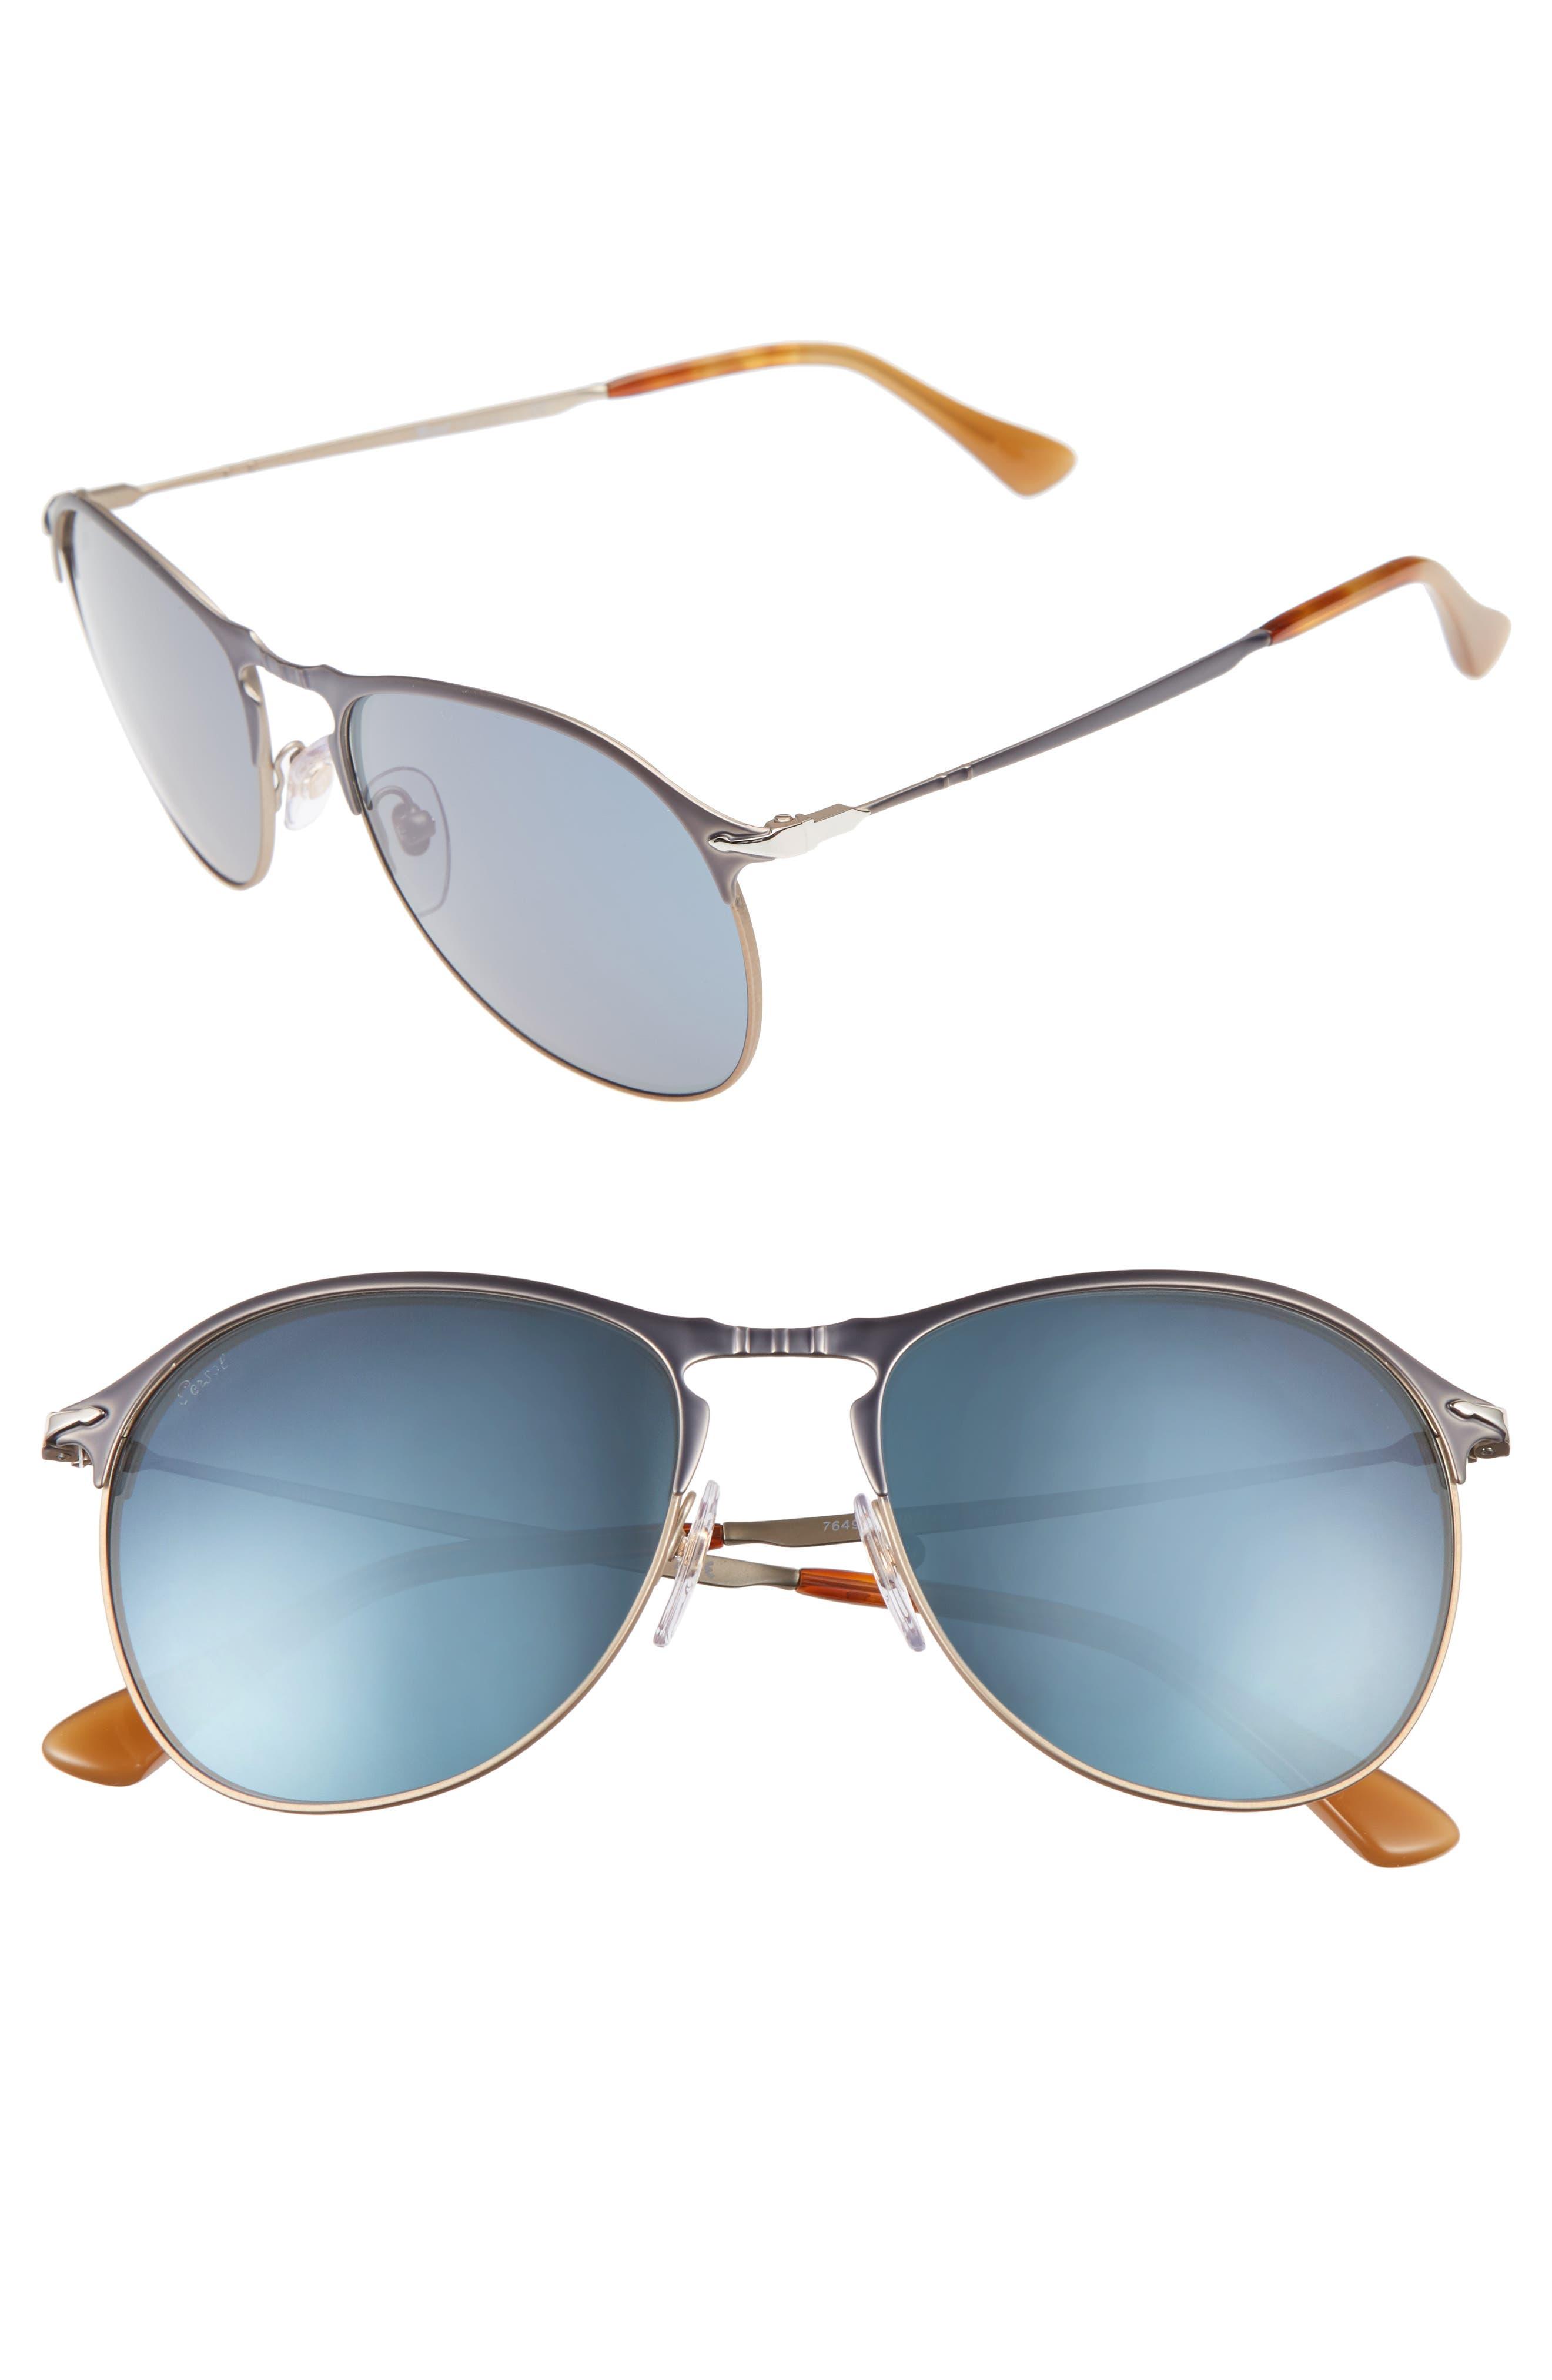 Main Image - Persol Sartoria 56m Aviator Sunglasses